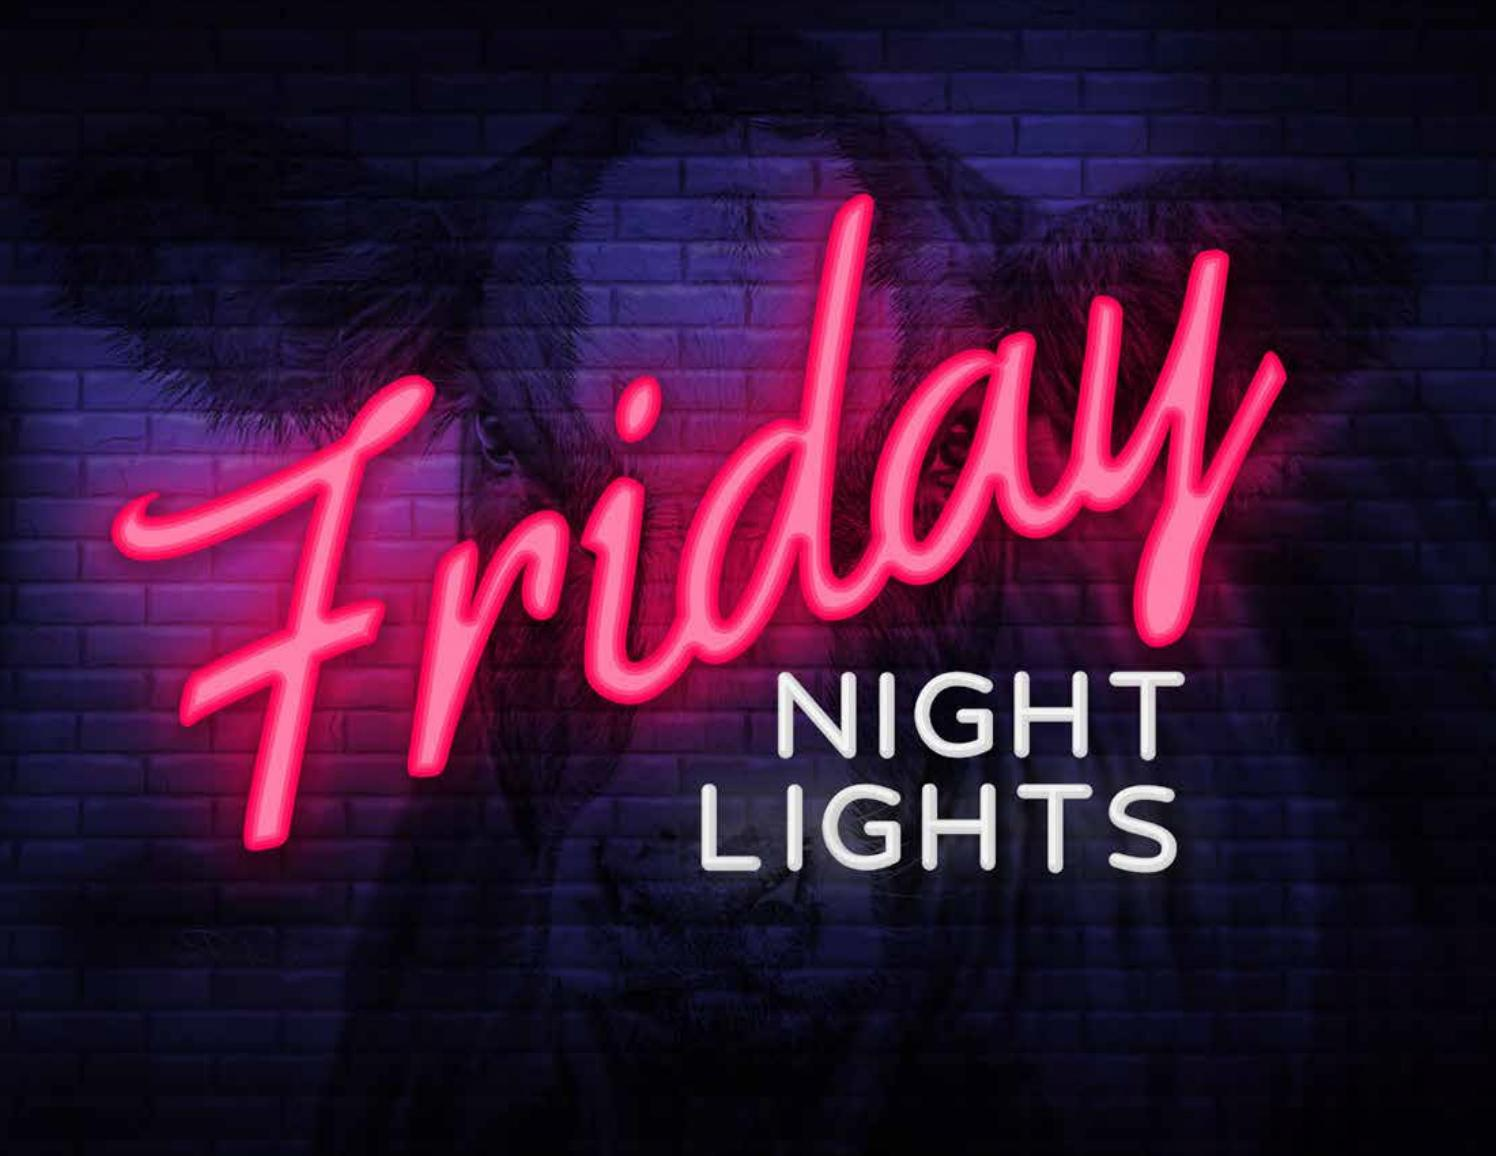 Friday Night Lights 2018 By Bohrson Marketing Services Ltd Issuu